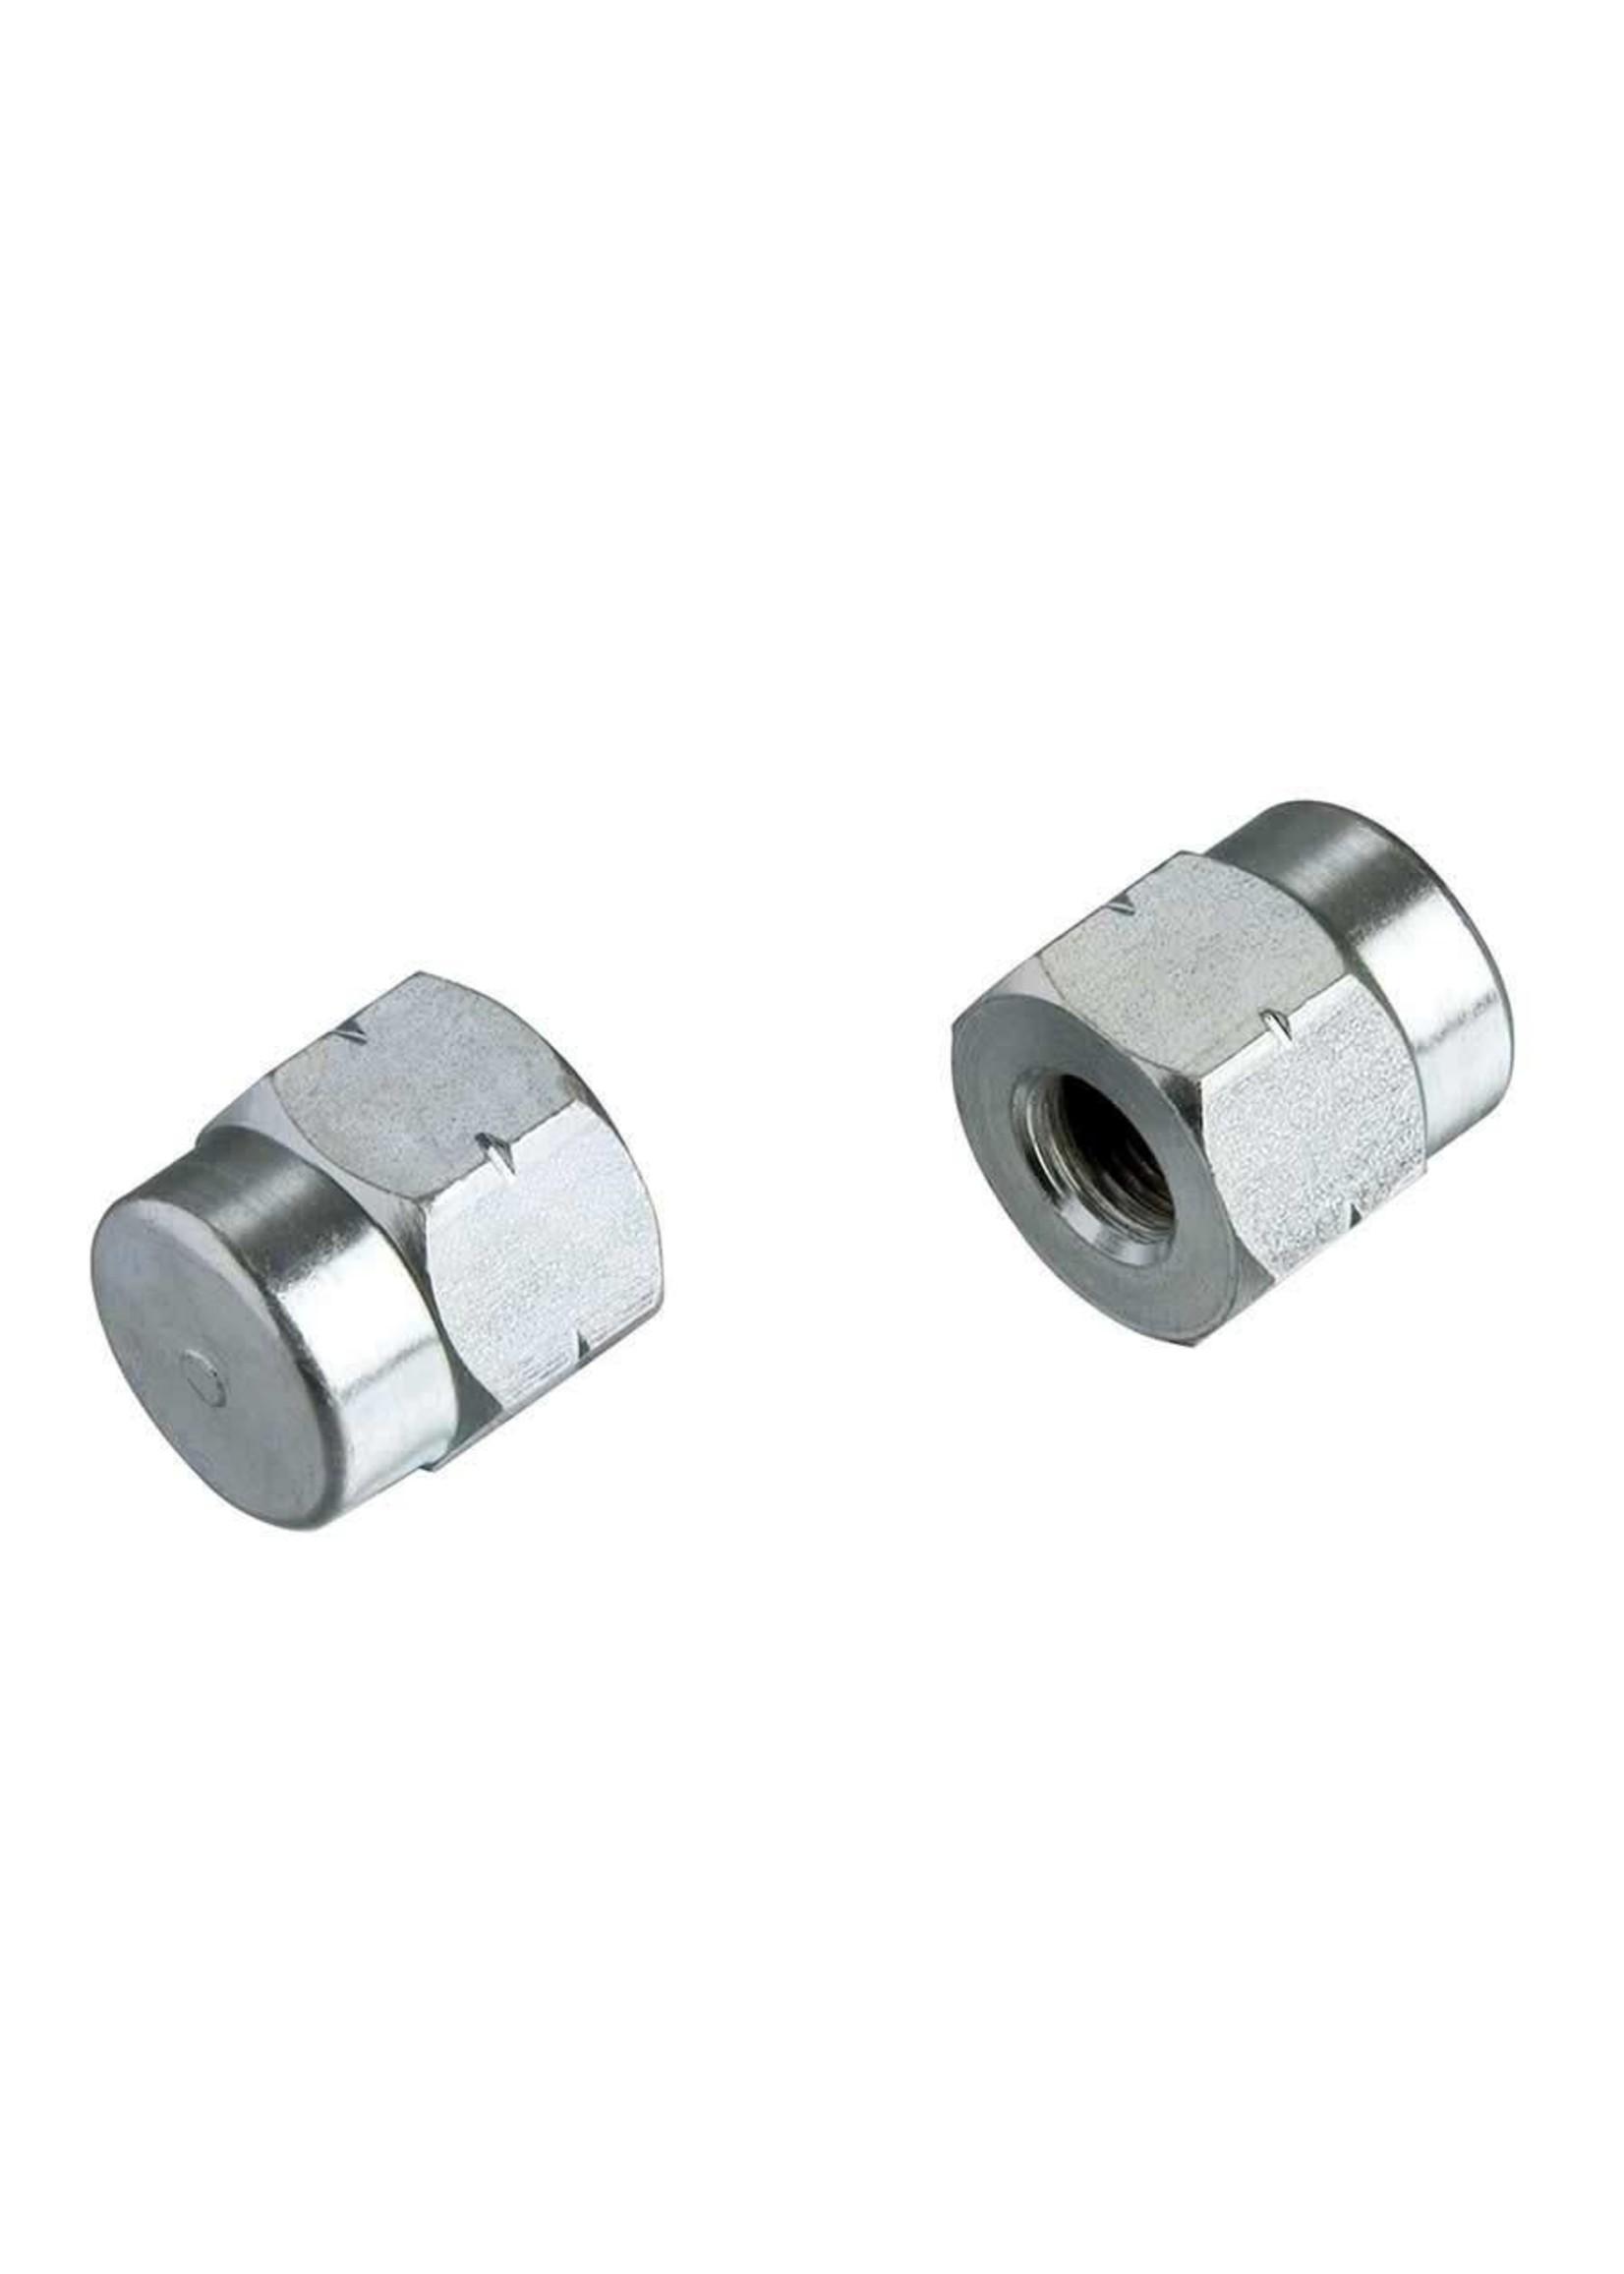 Tacx Tacx, T1415, Axle nut M10 x 1 (set of 2)